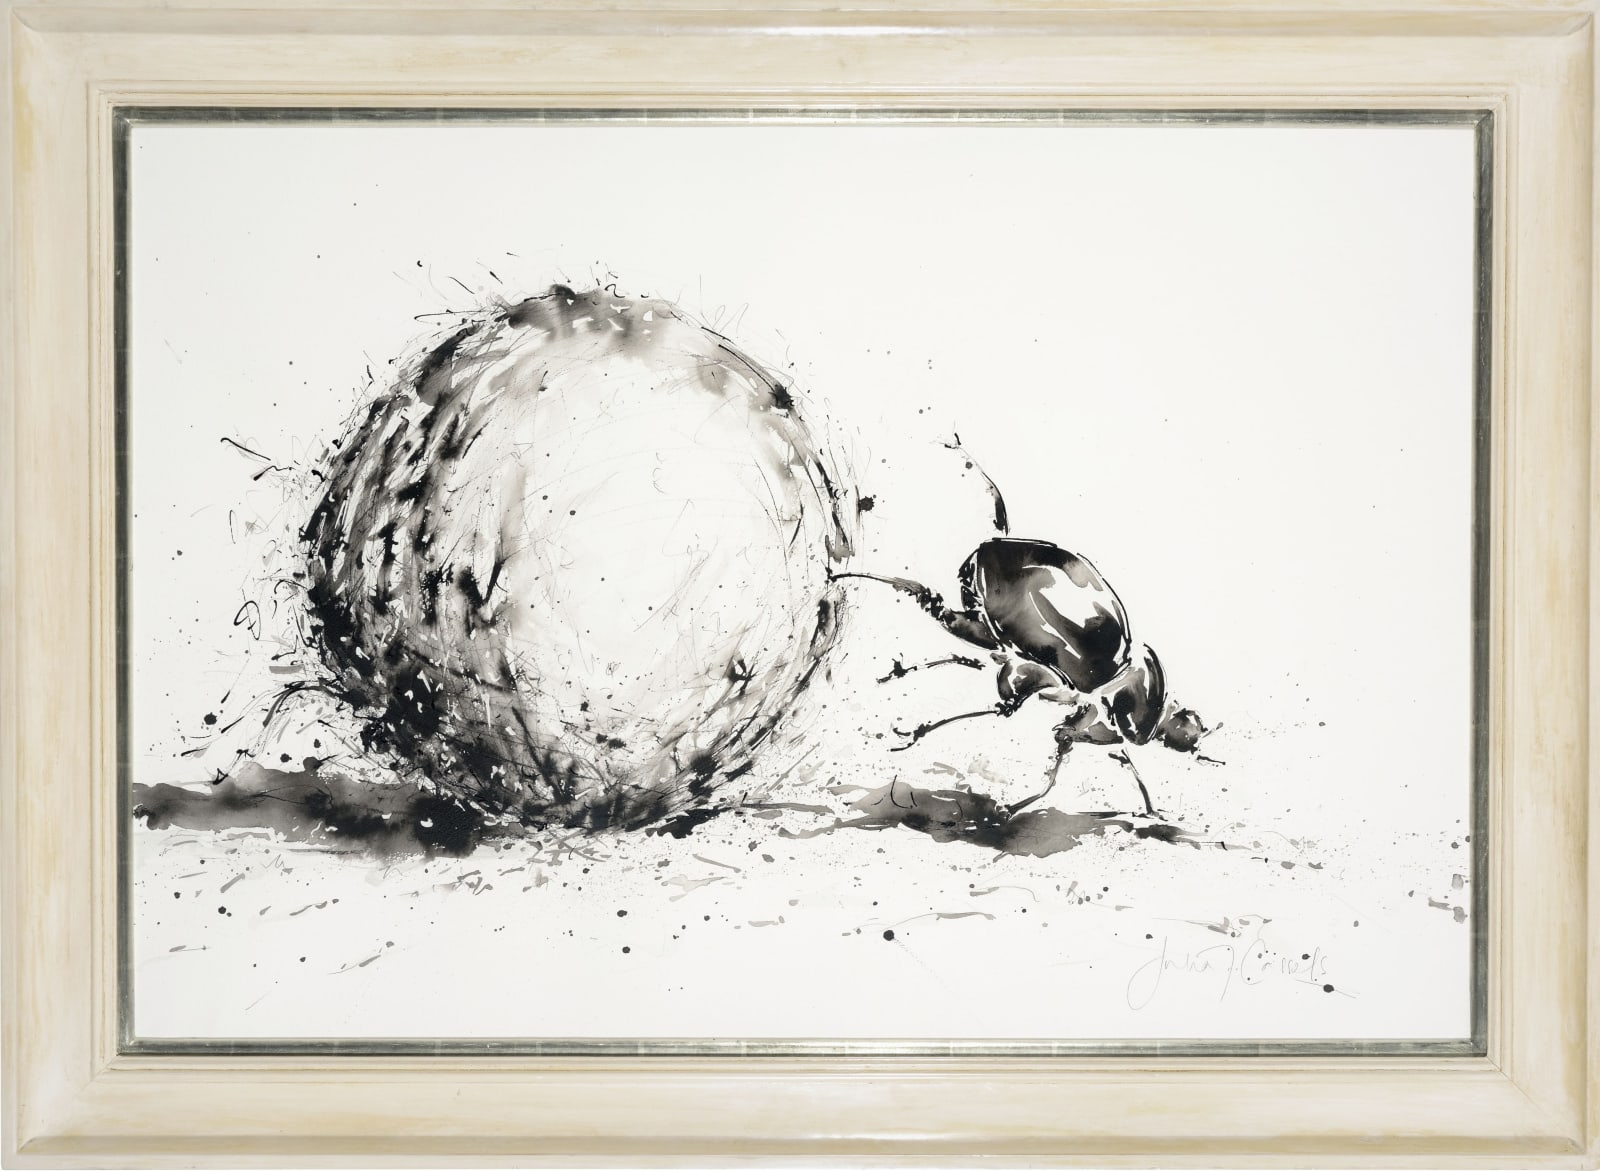 Dung Beetle, £2,250